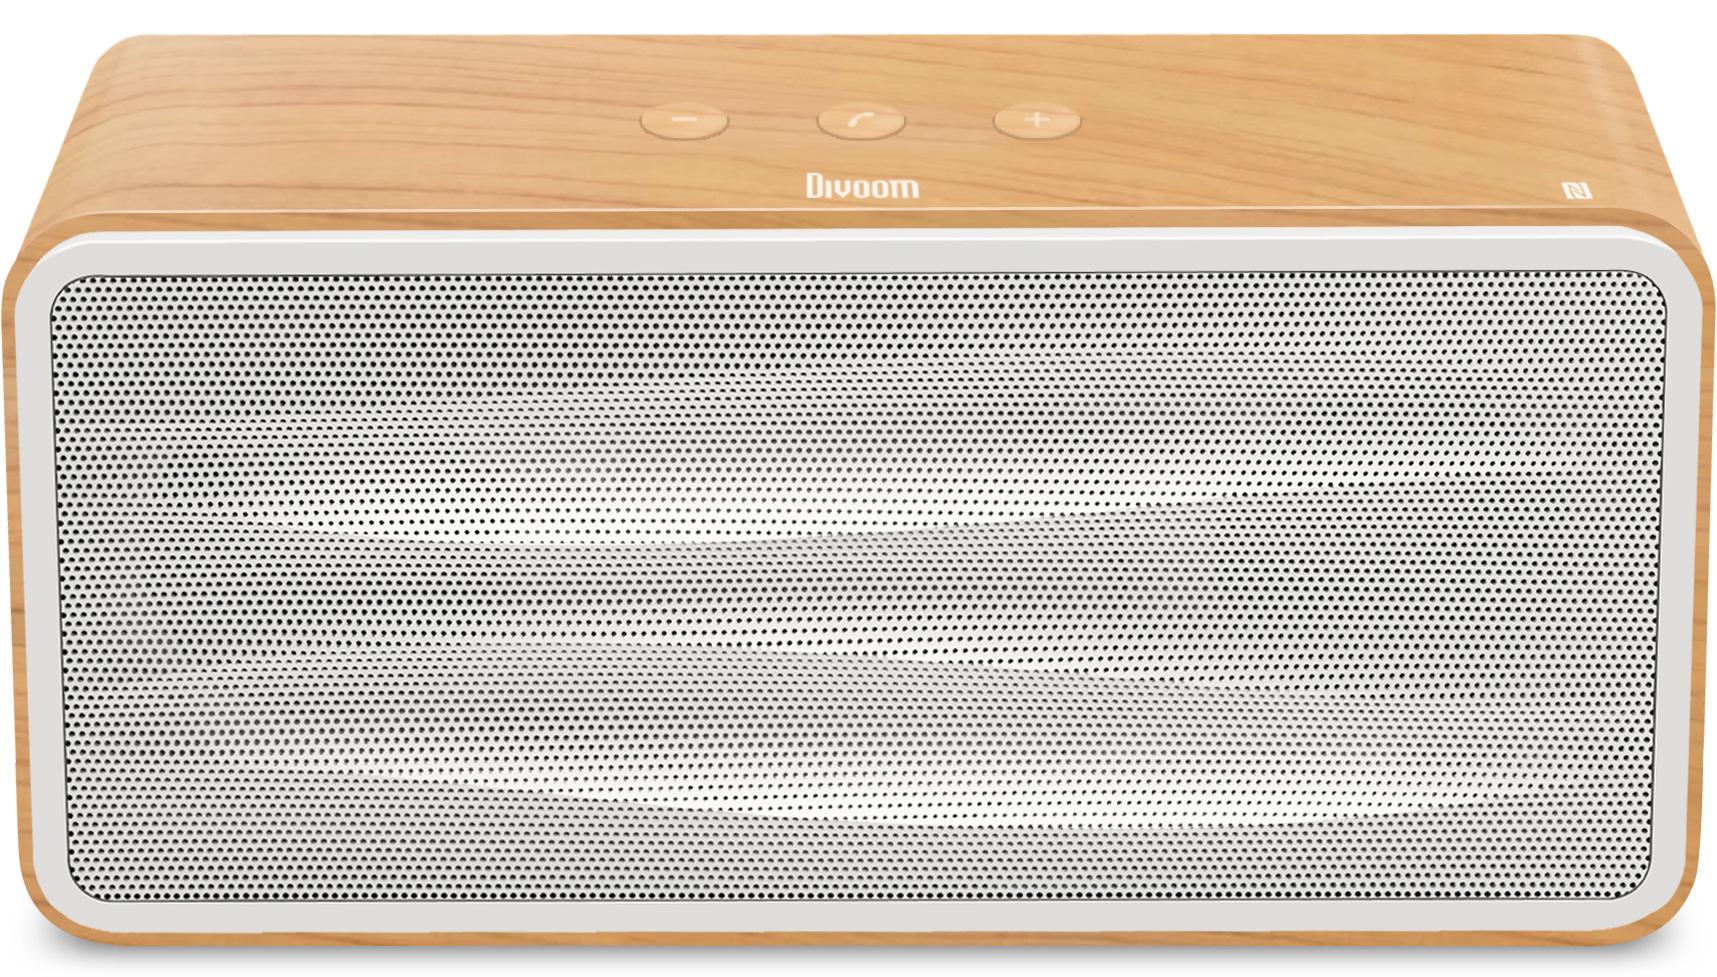 Divoom Onbeat-500 BT 4.0 Wireless Speaker Ivory Wood